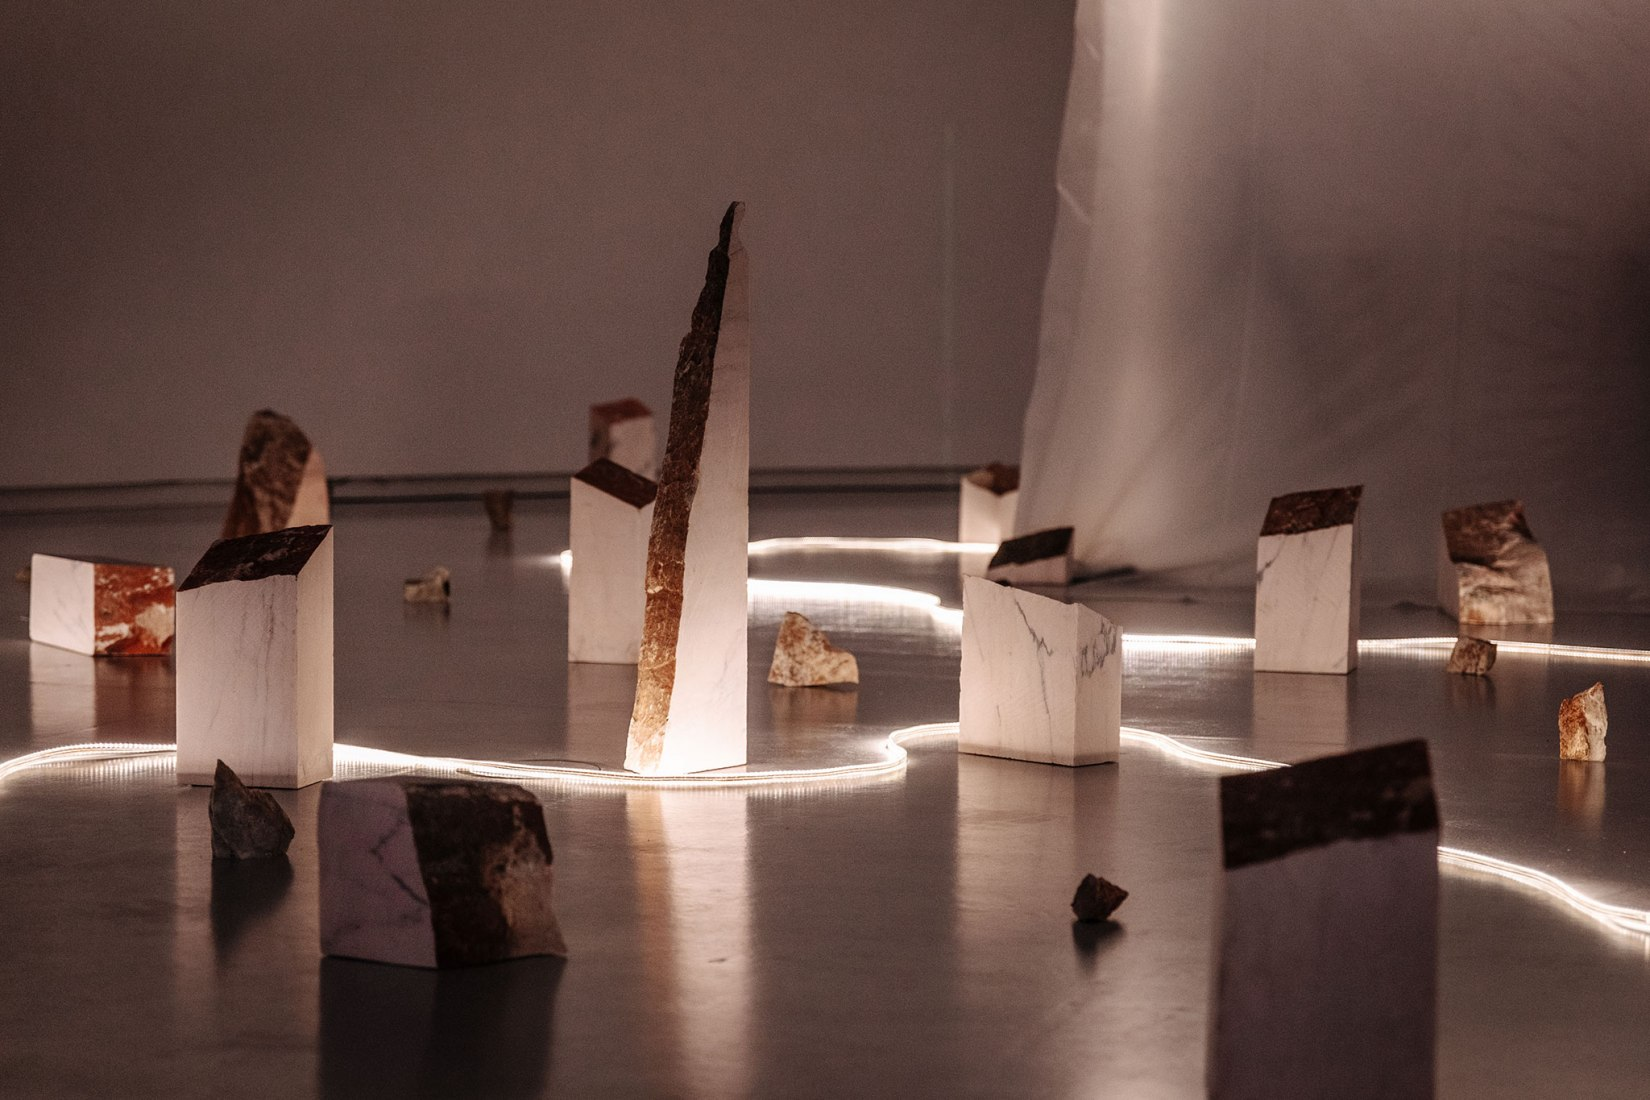 Mush Rooms by BUREAU - Daniel Zamarbide. Photograph by Francisco Craveiro